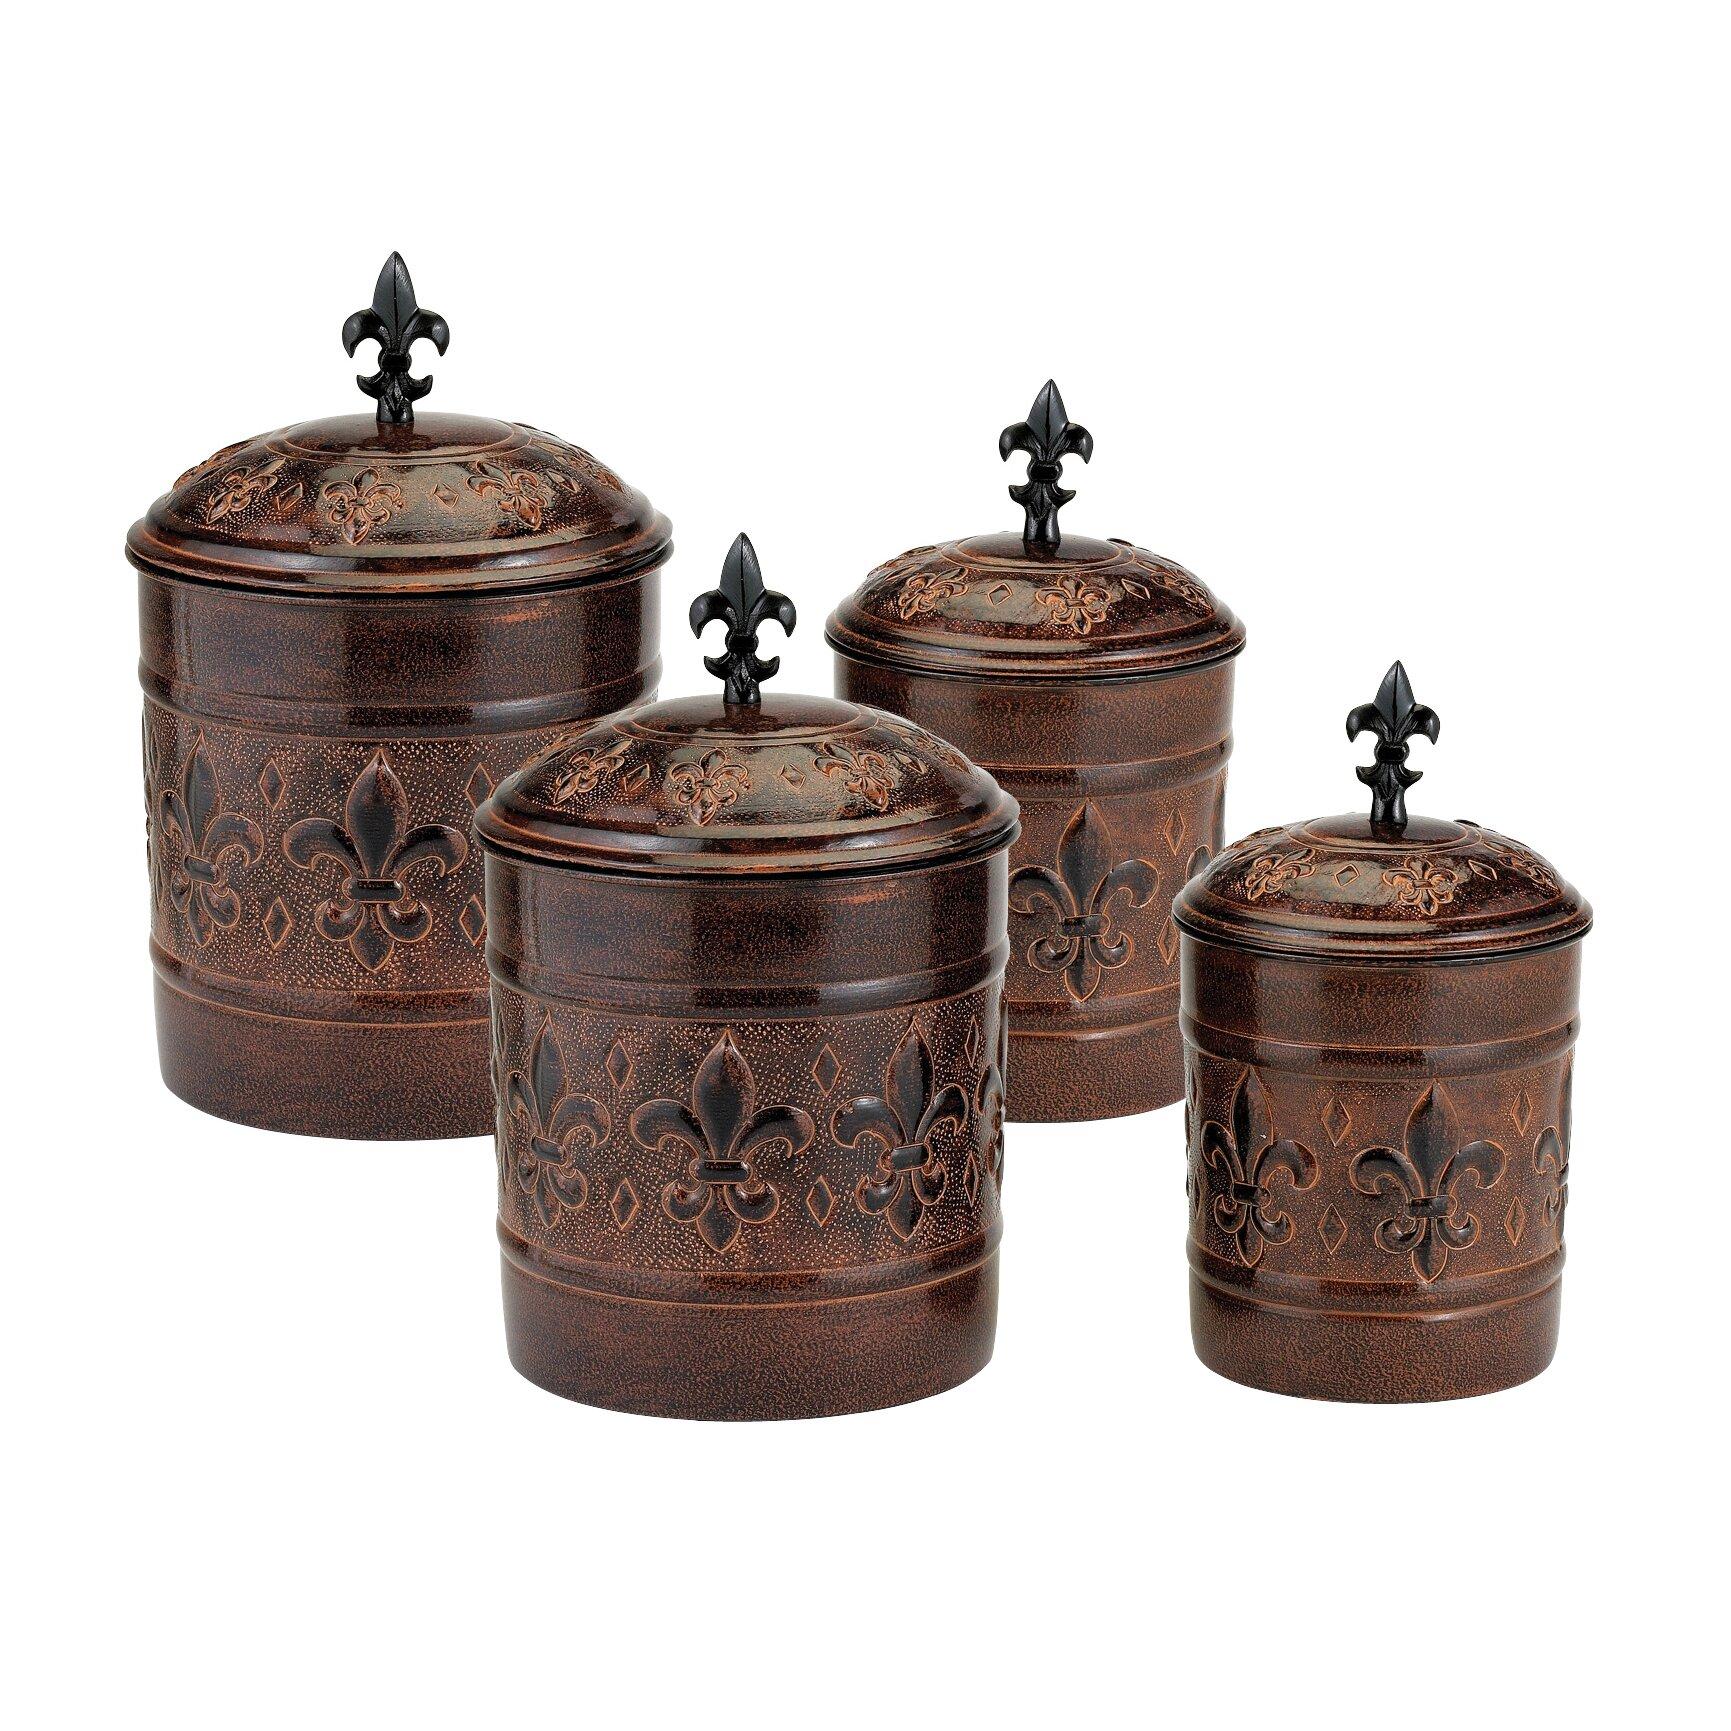 glass kitchen canisters airtight online get cheap airtight handmade kitchen canisters jars you ll love wayfair versailles 4 piece kitchen canister set